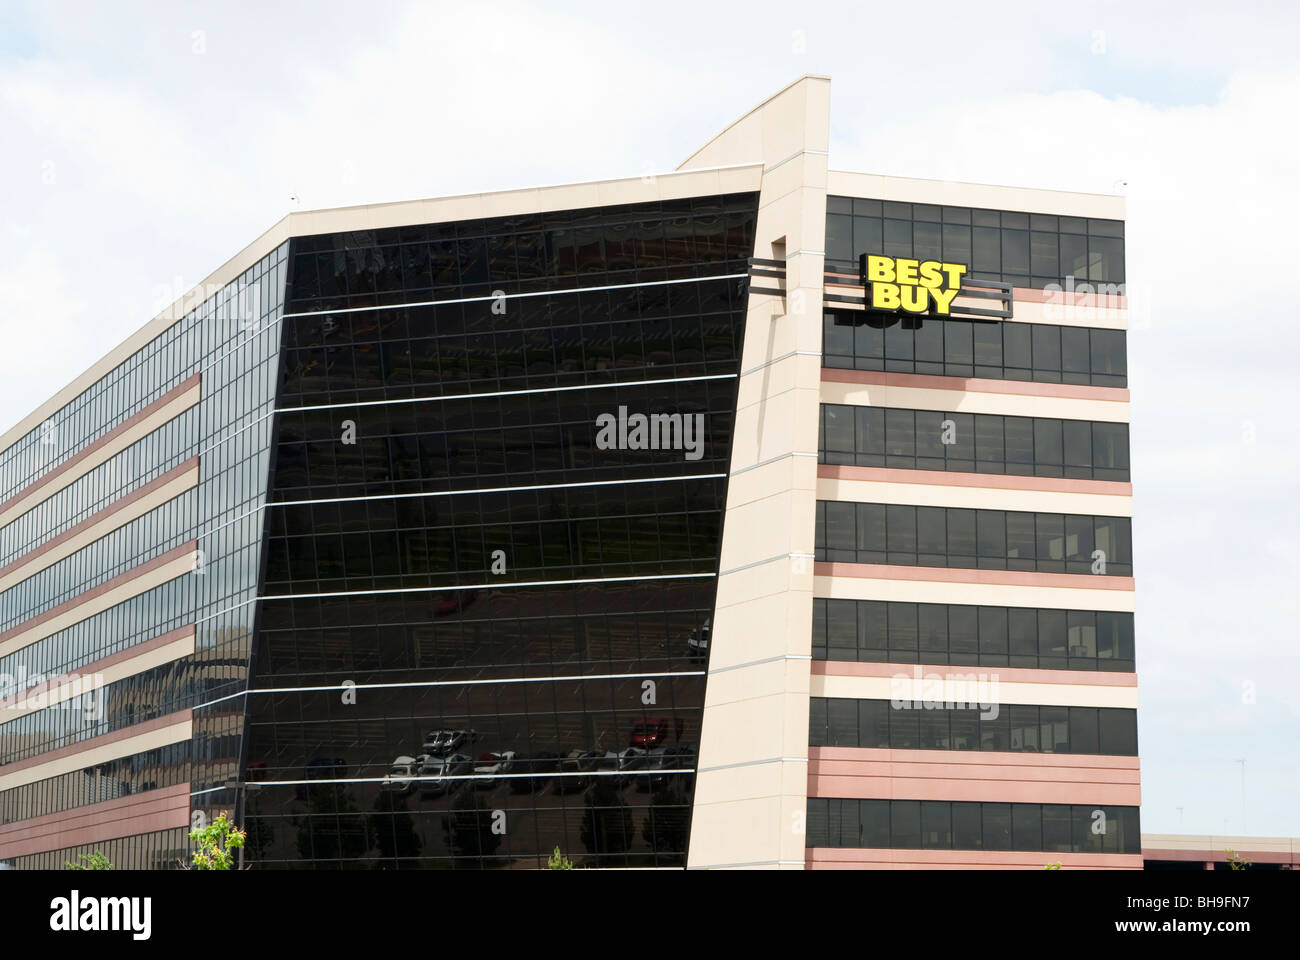 Best Buy corporate headquarters office building in Bloomington, Minnesota - Stock Image